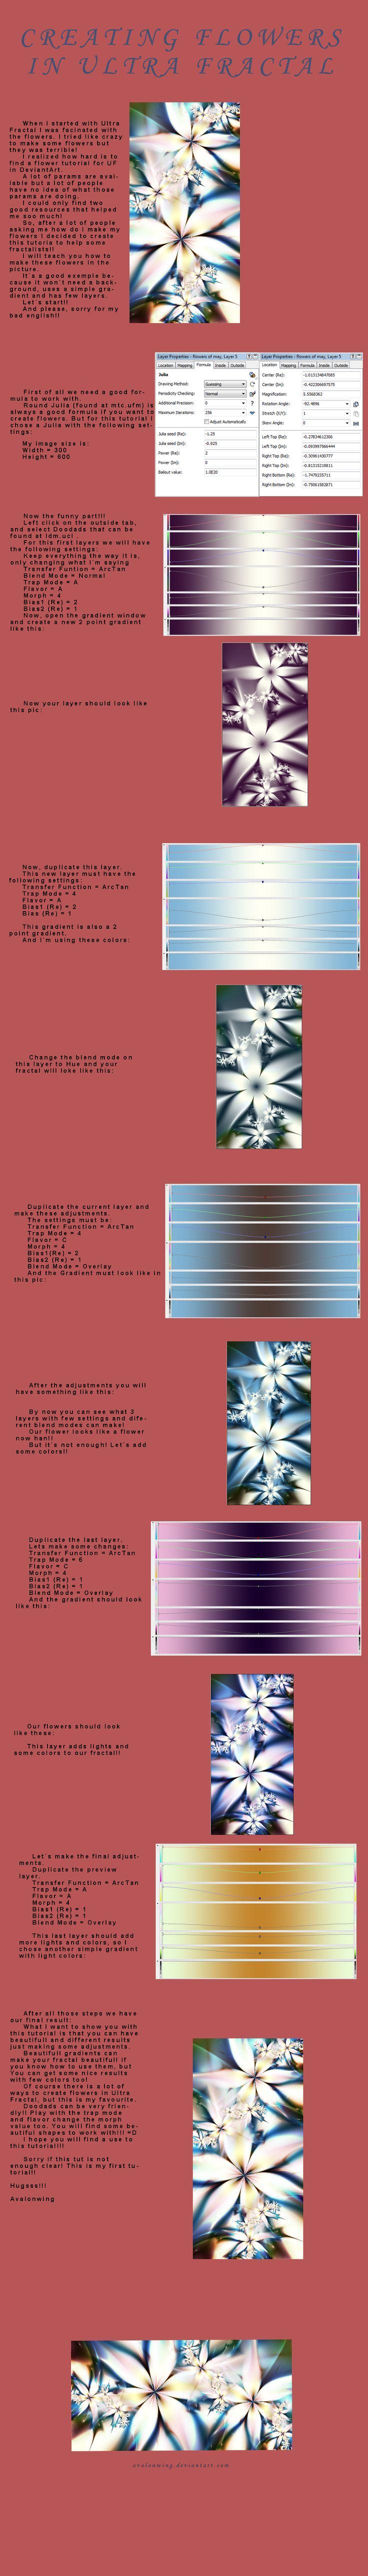 10 best fractal images on pinterest fractal art fractals and i have been asked about how do i create my flowers in ultra fractal baditri Gallery